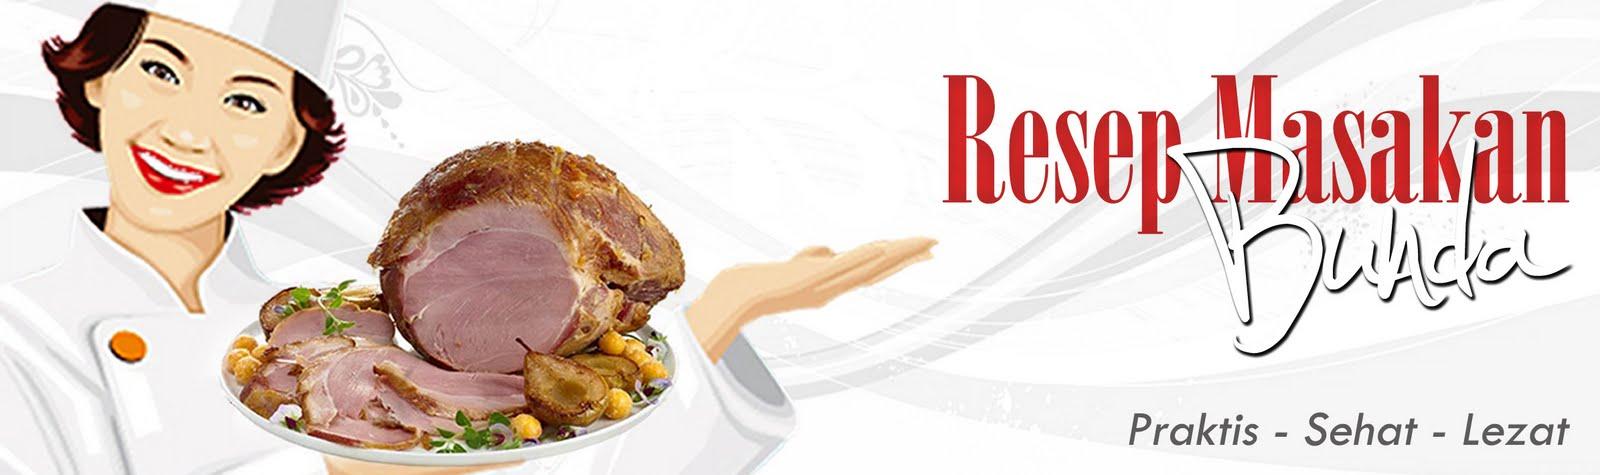 Resep Masakan Bunda